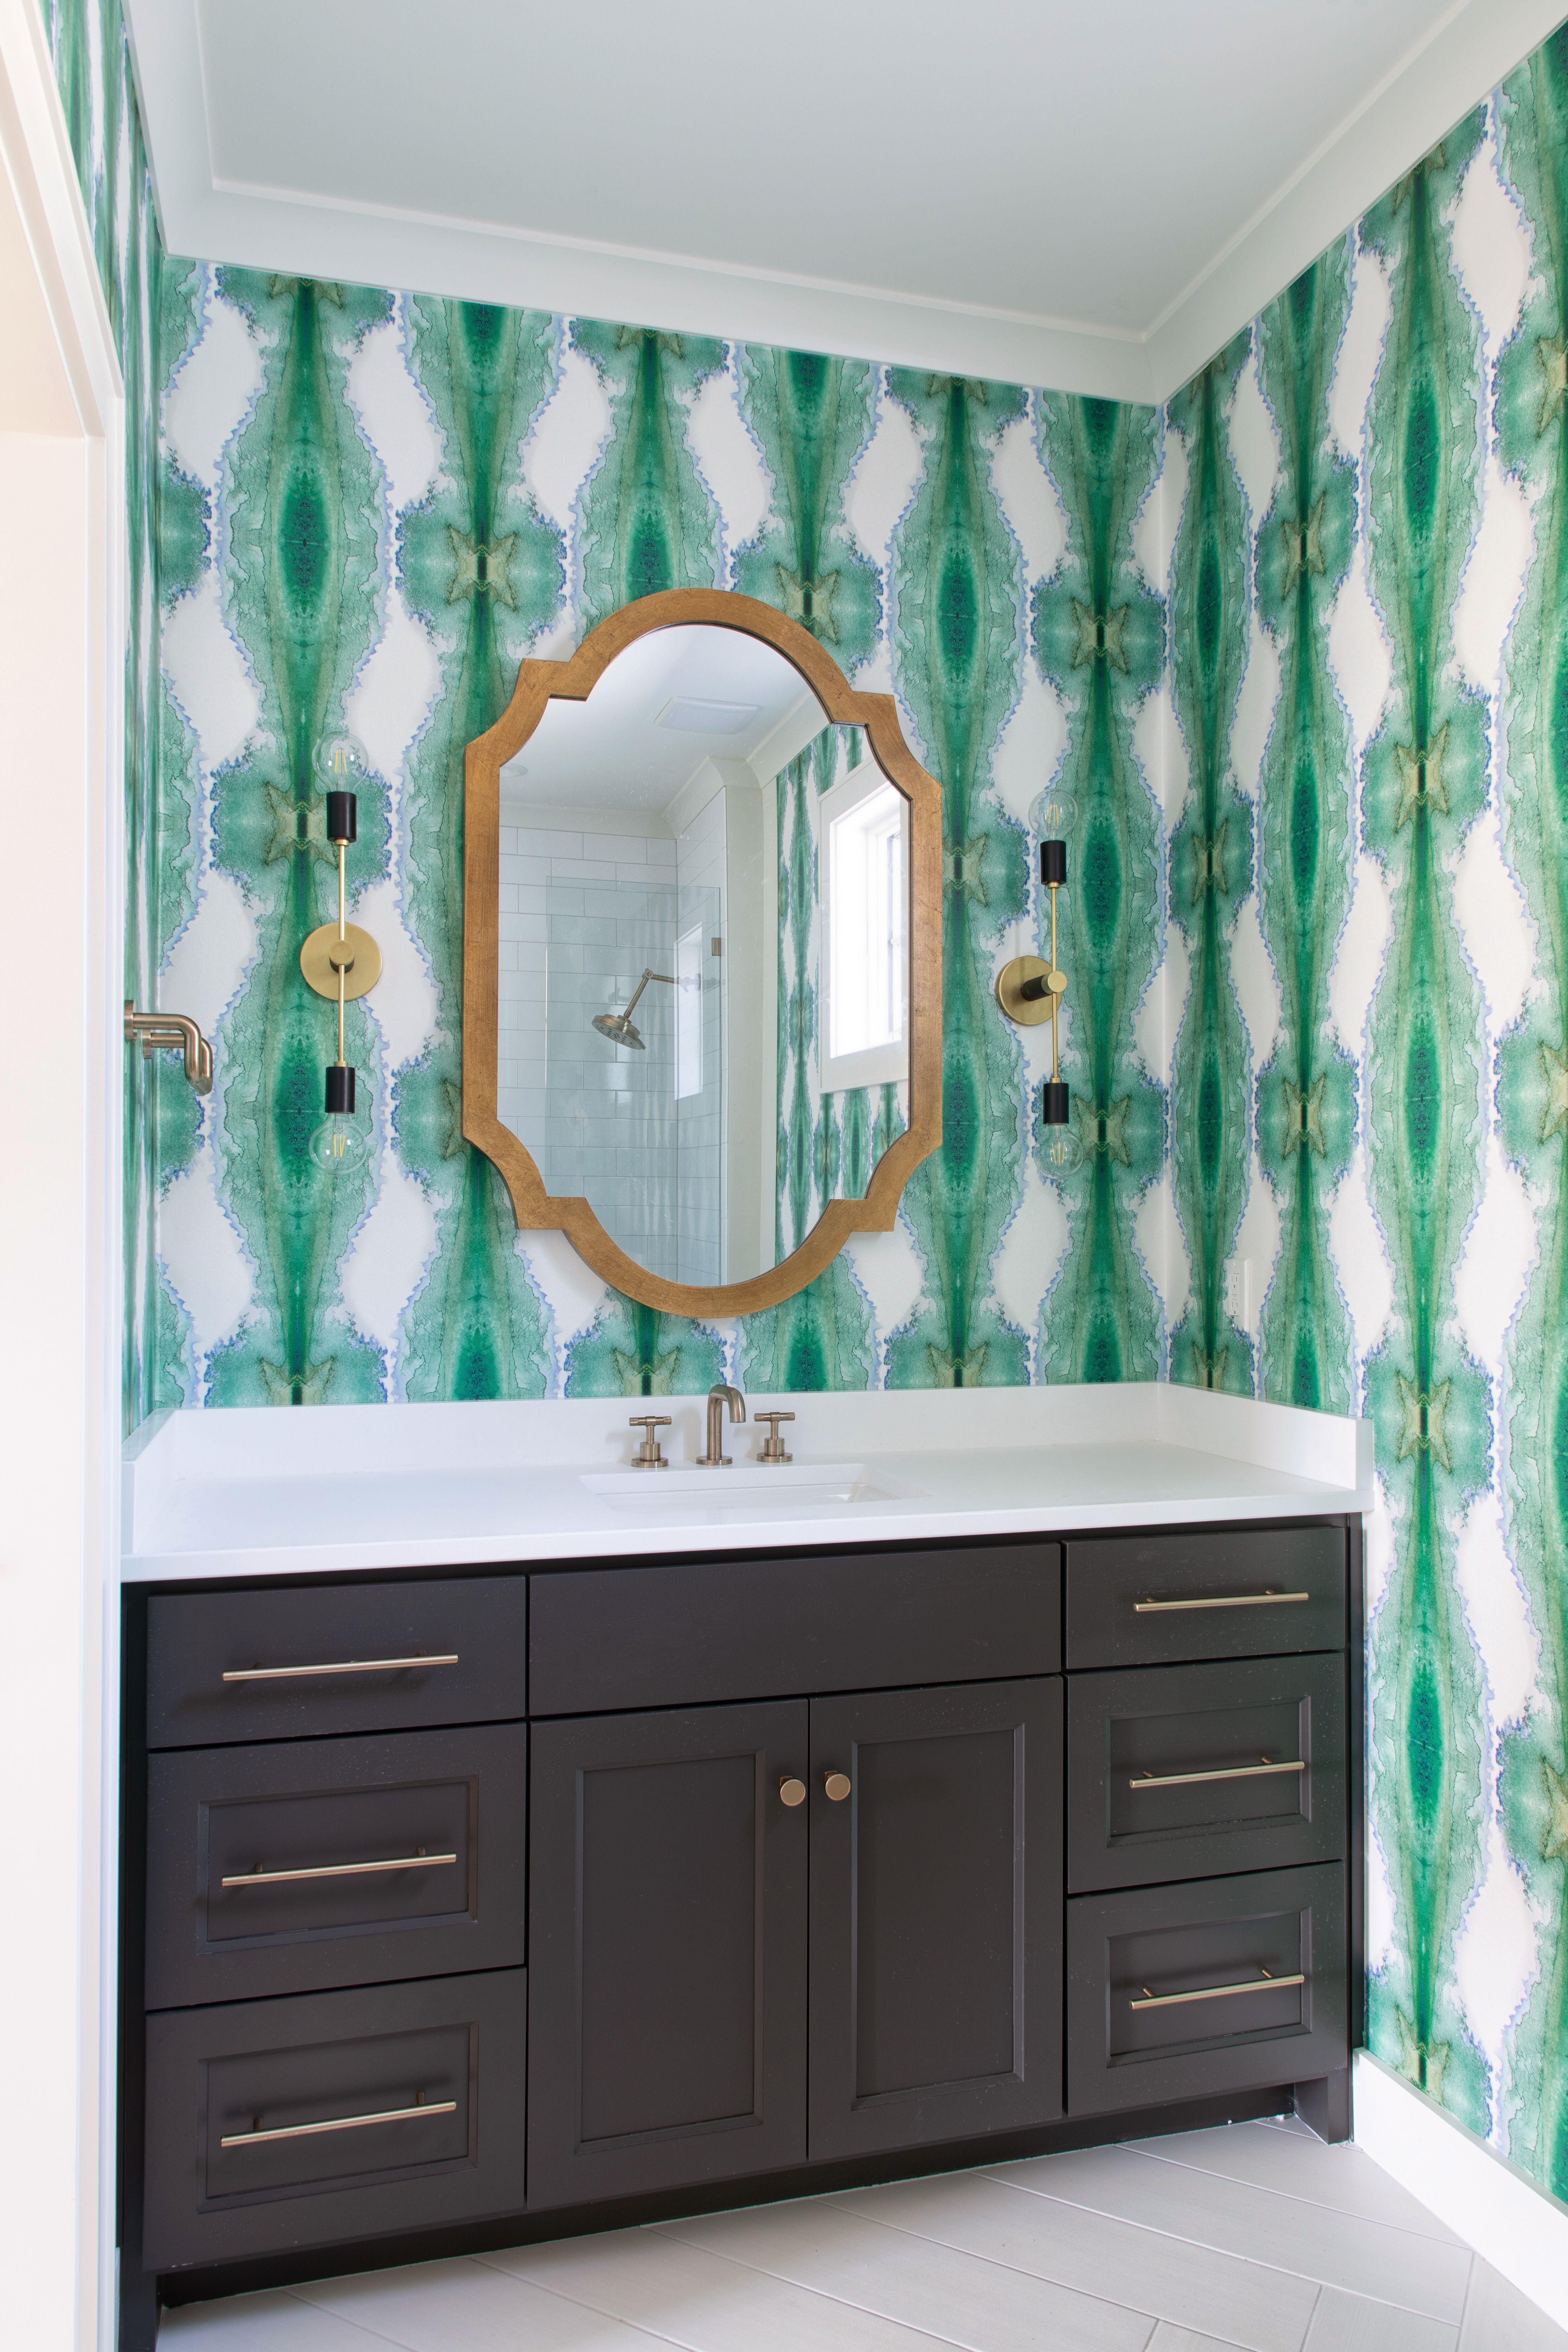 Wallpaper bath Painting bathroom White oak